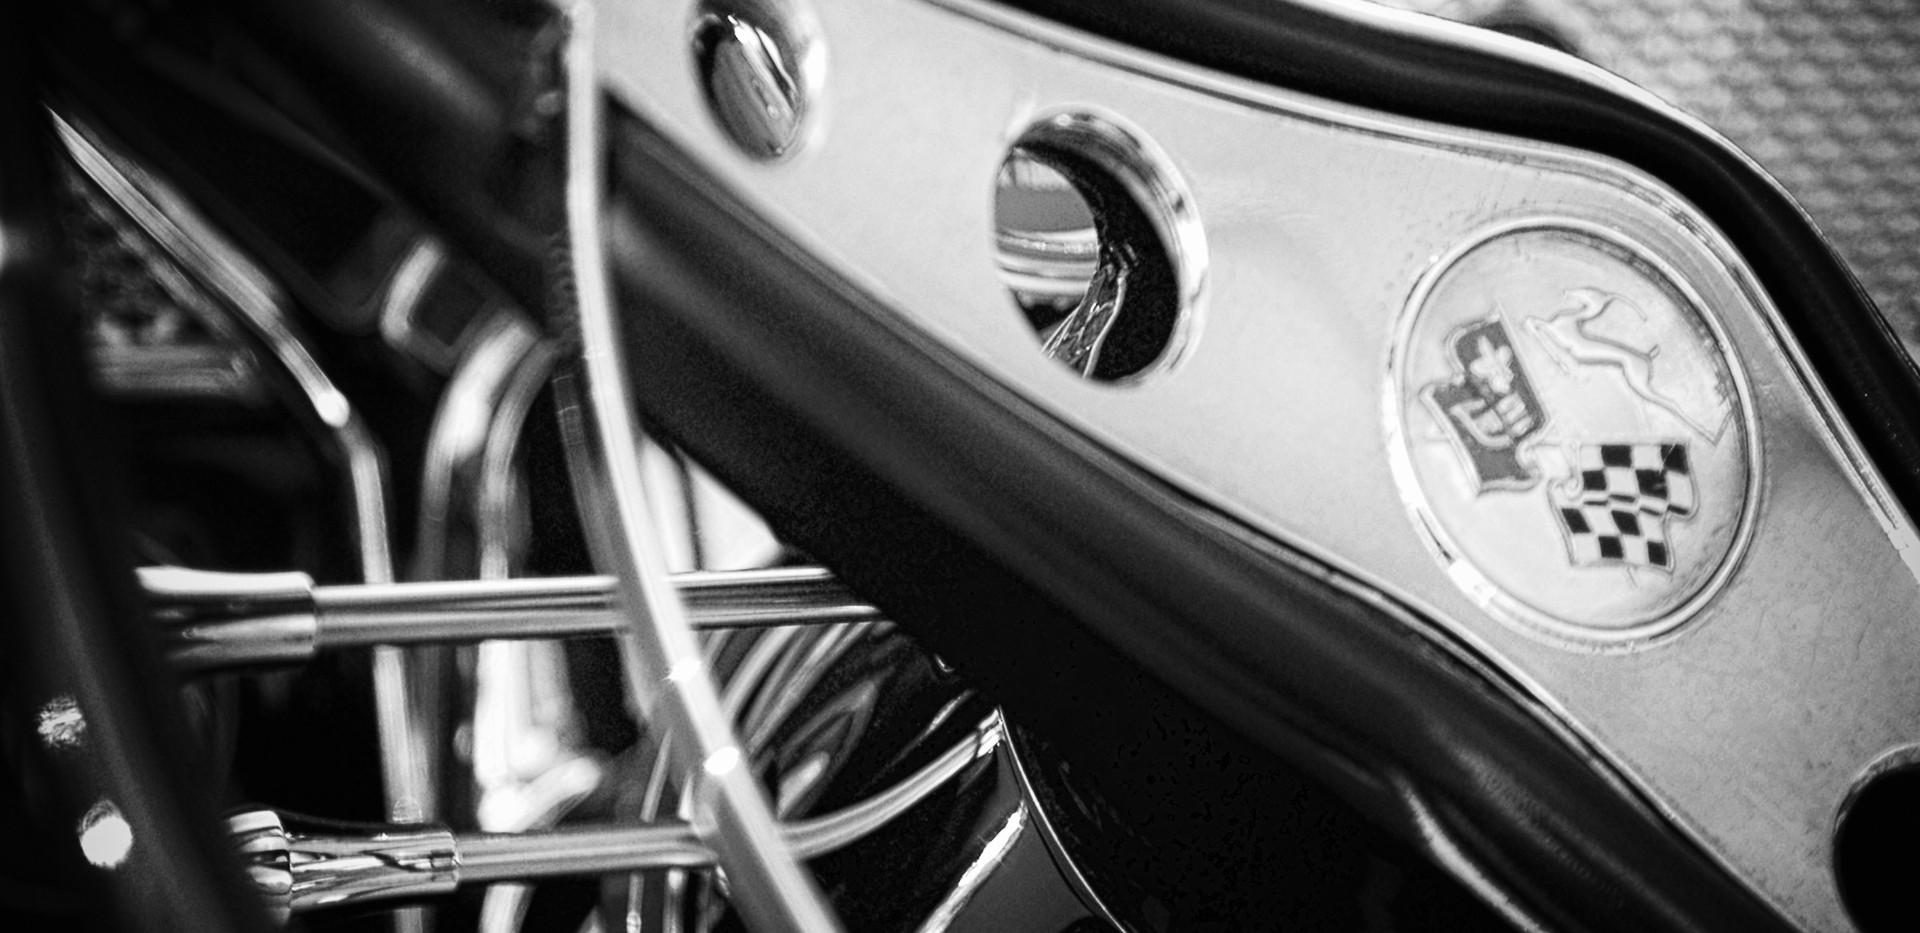 Chevy Impala.jpg